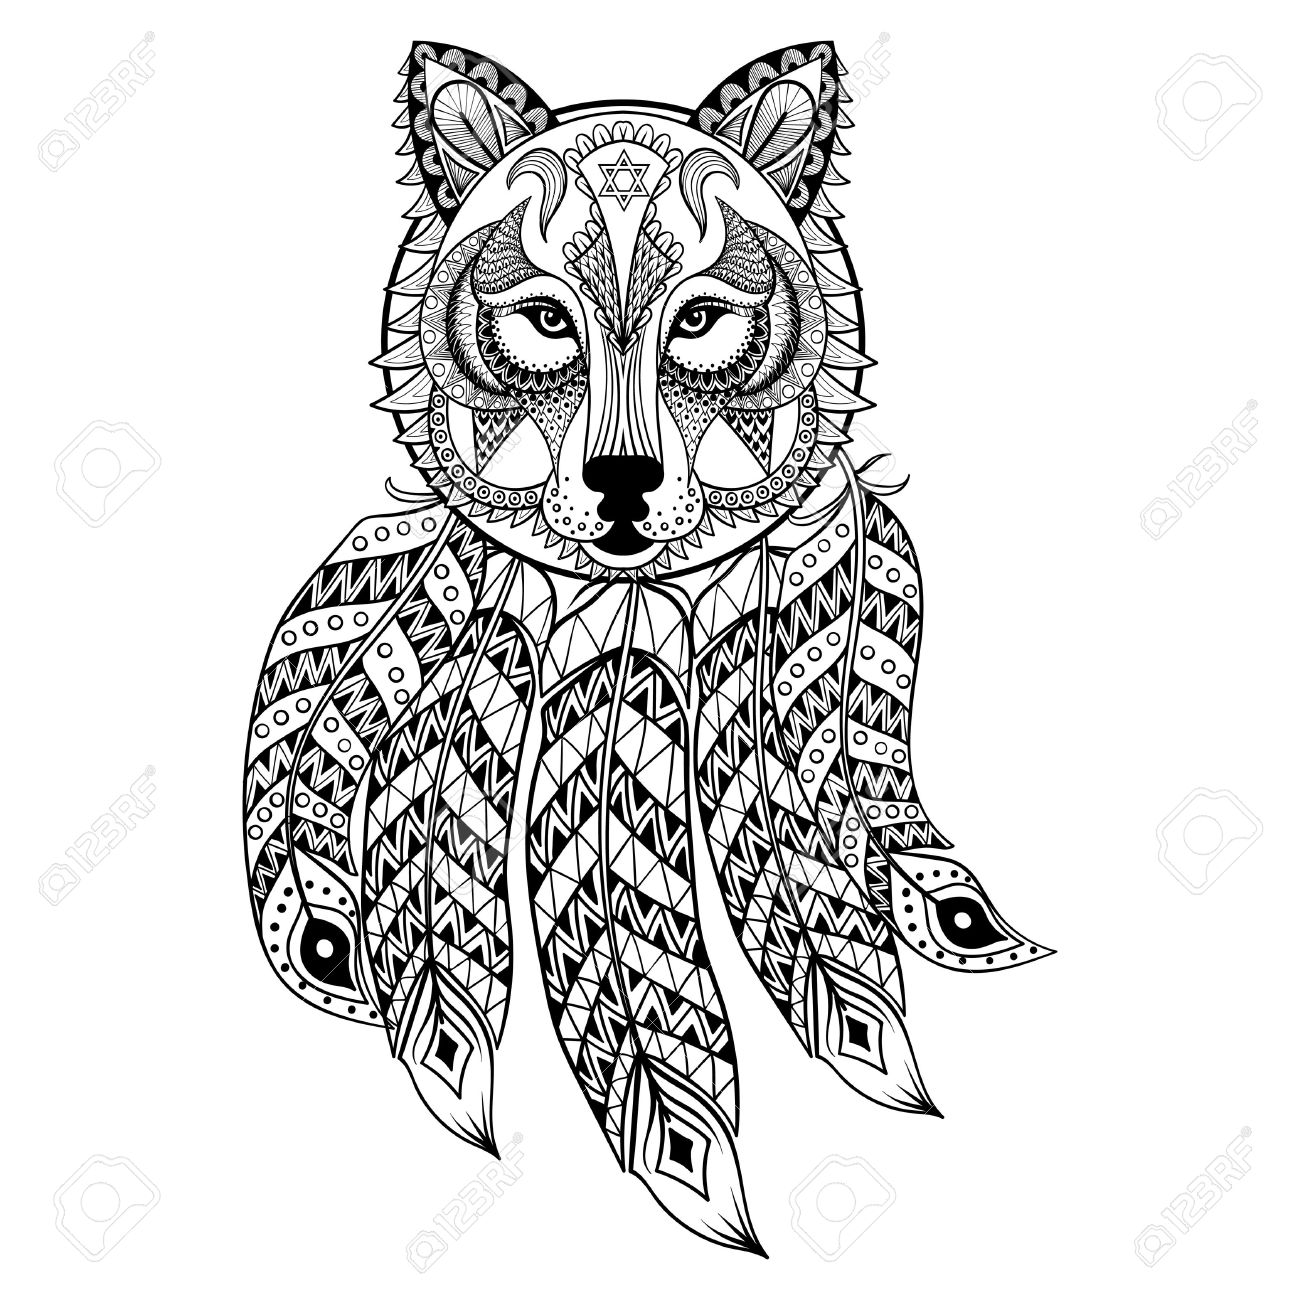 1300x1300 Vector Ornamental Wolf With Dreamcatcher, Ethnic Zentangled Mascot